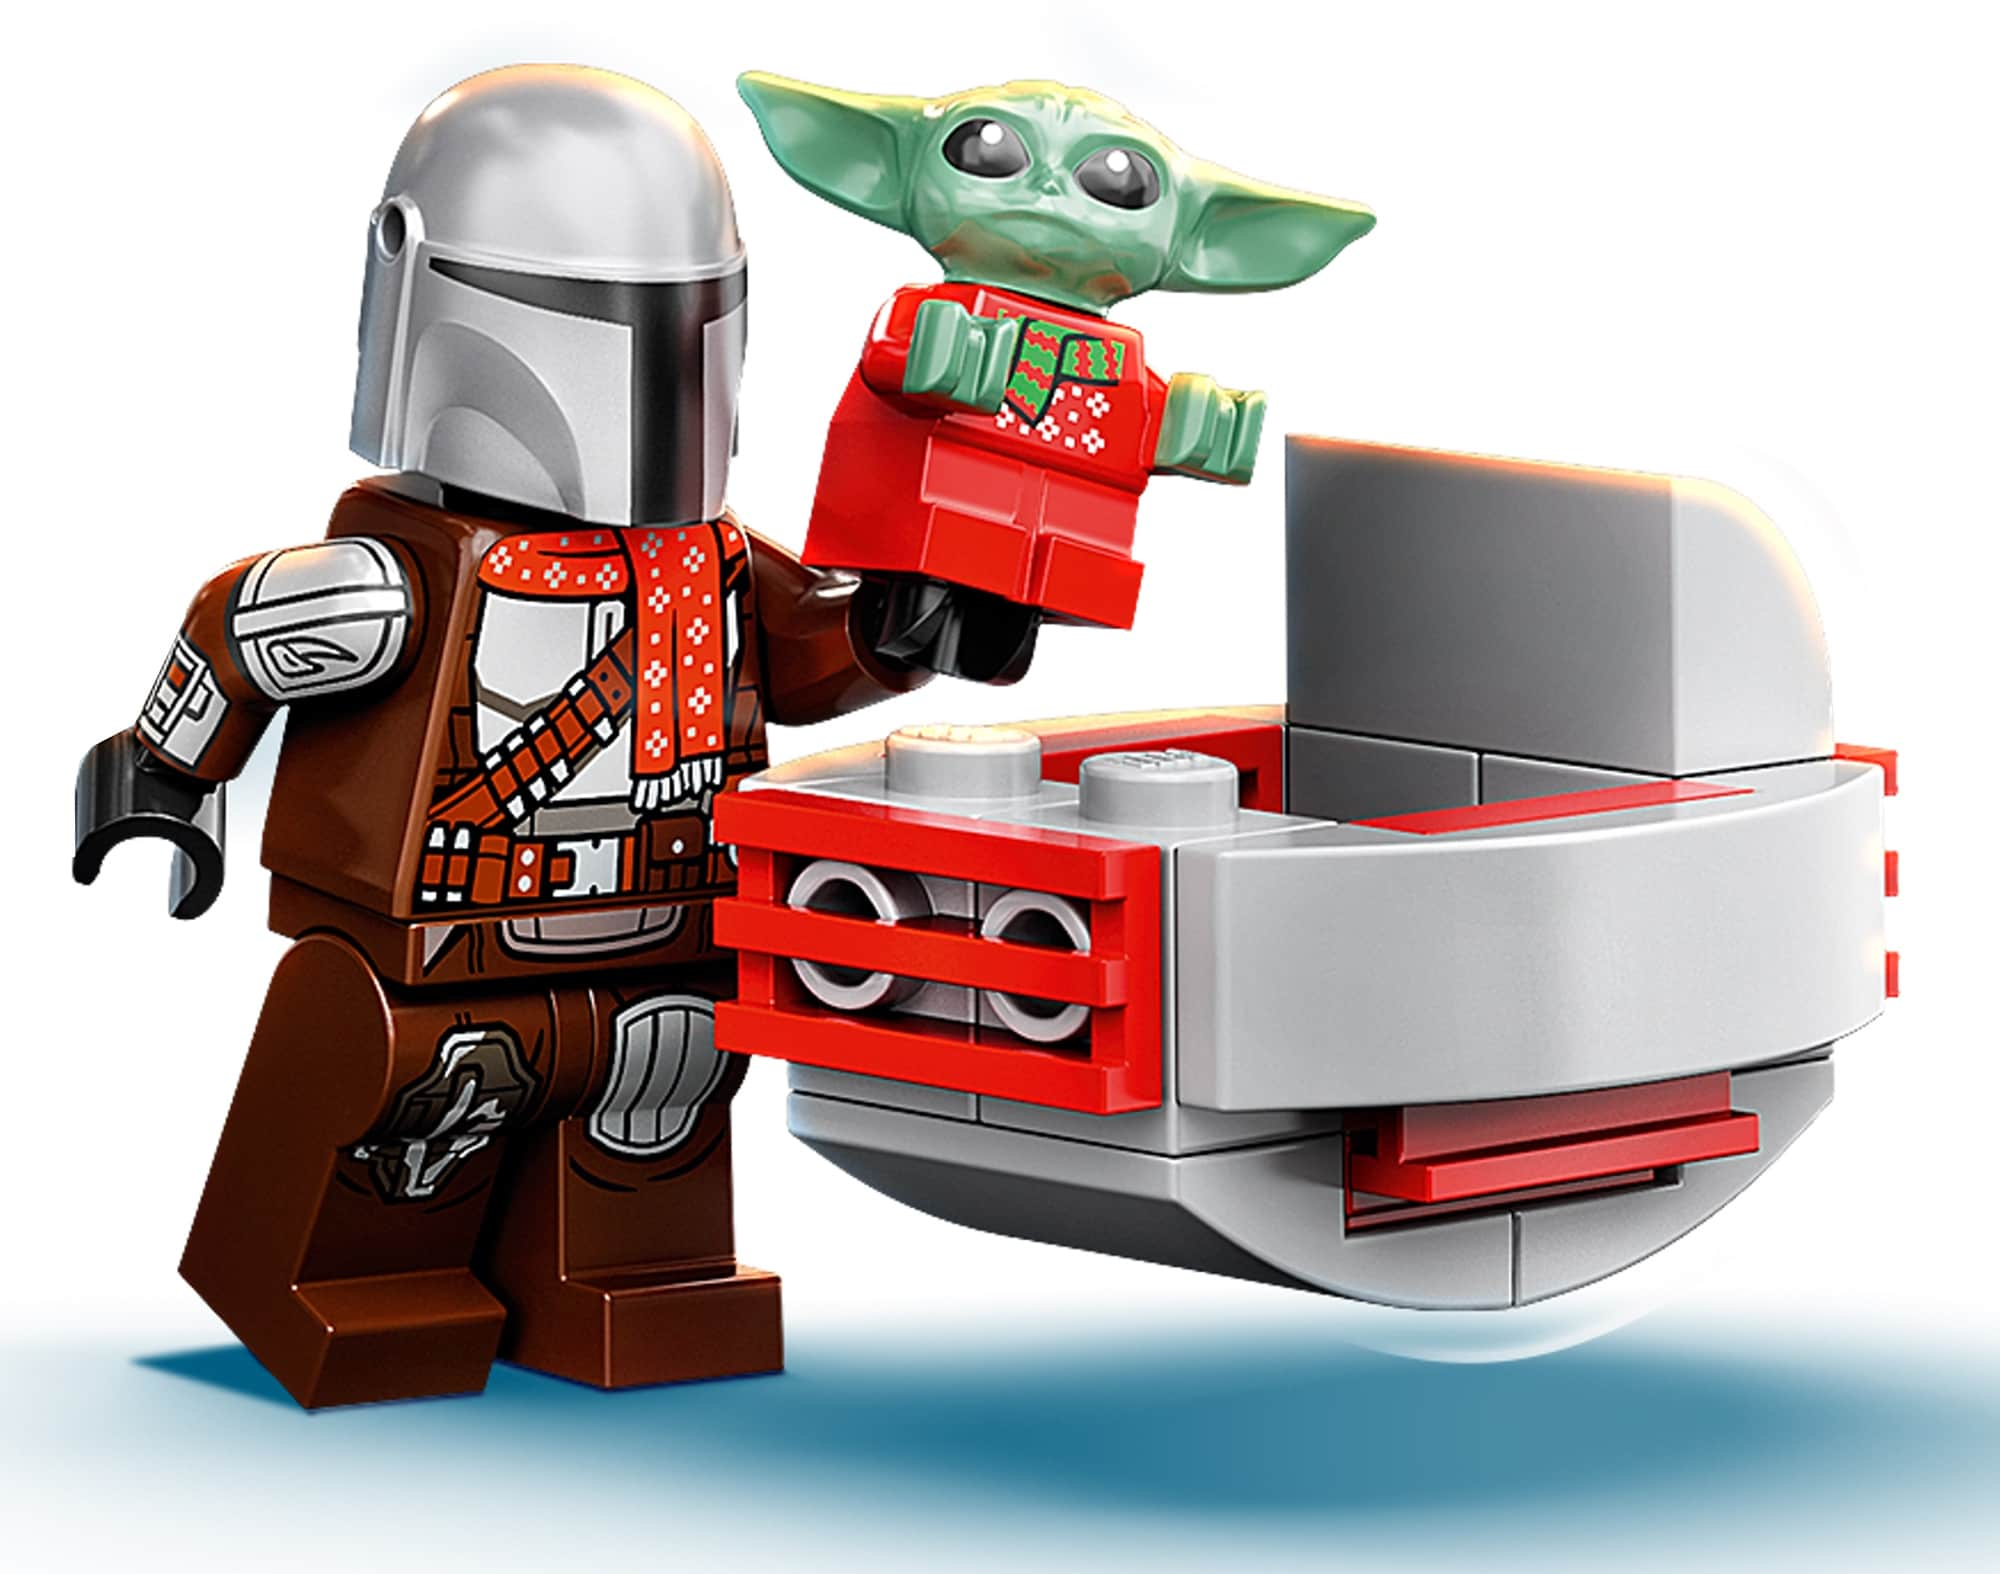 LEGO Star Wars Advenskalender 2021 Exklusive Figuren